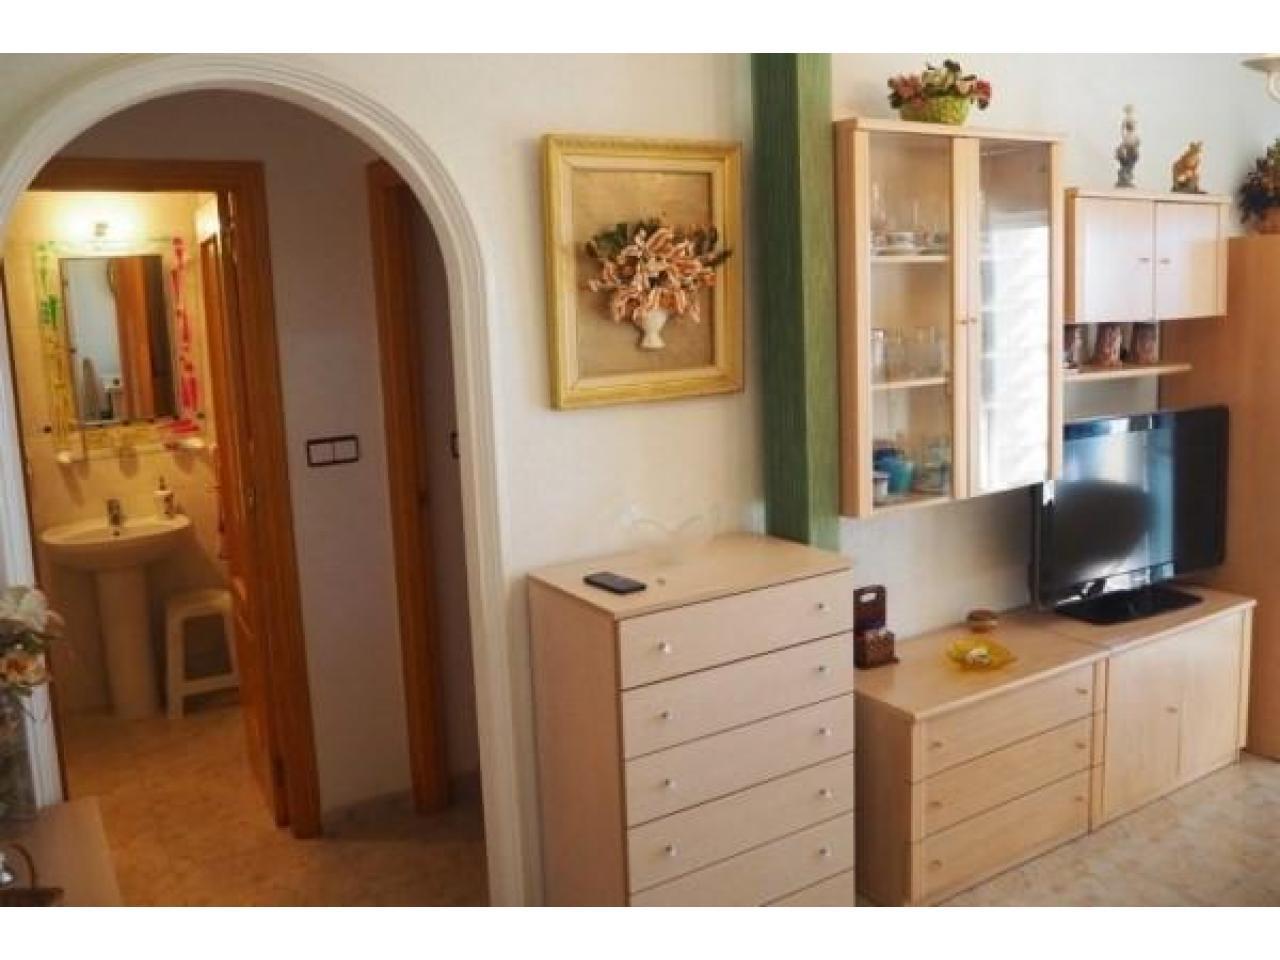 Недвижимость в Испании, Квартира c видами на море в Торревьеха,Коста Бланка,Испания - 8